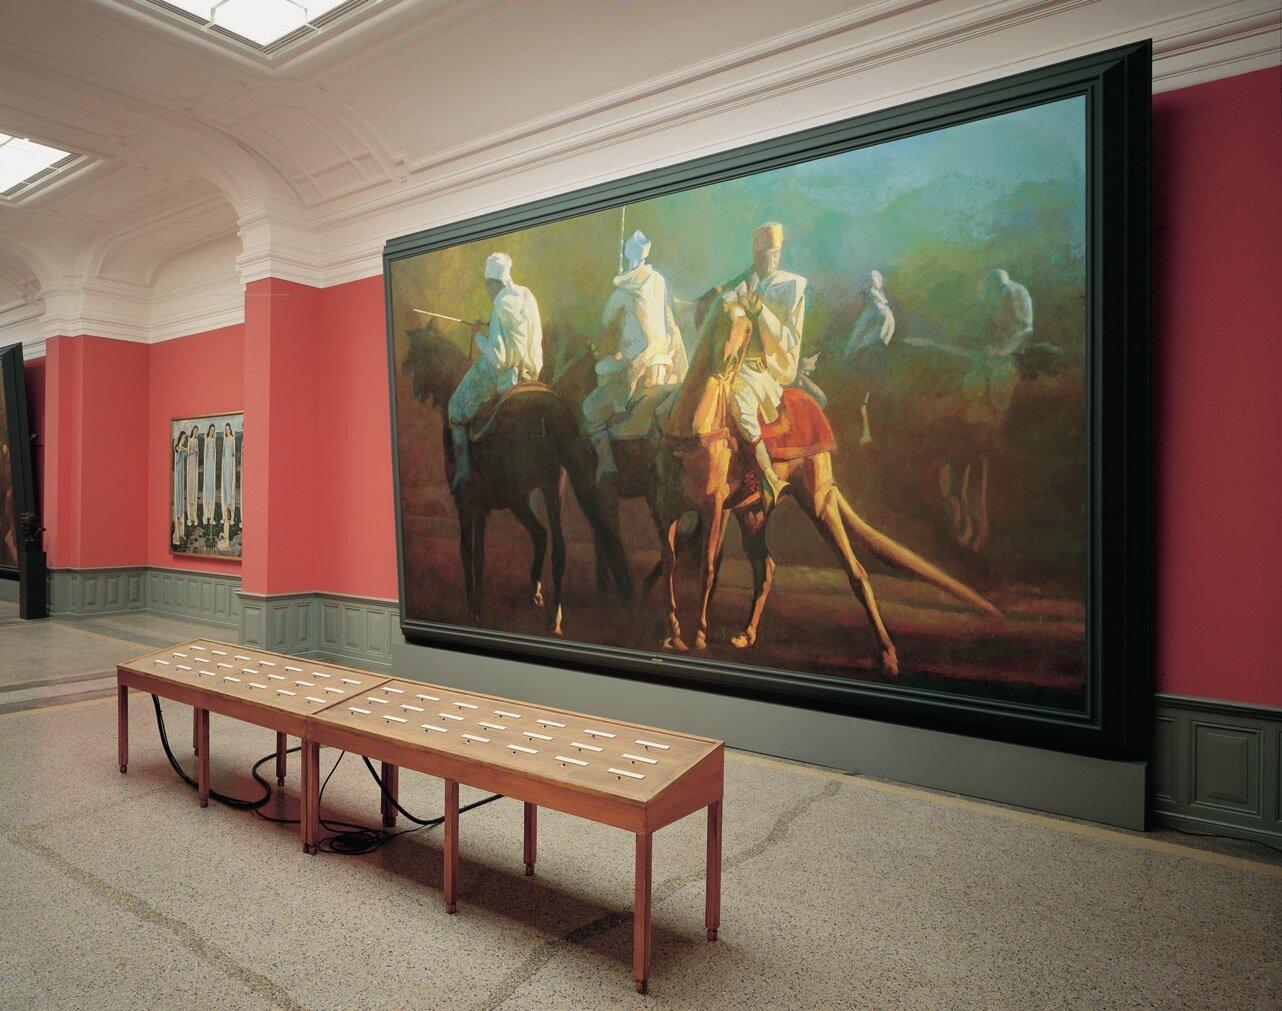 View-of-installation-The-Three-Riders-Kunstmuseum-Bern-Berne-2000-Ph.jpg